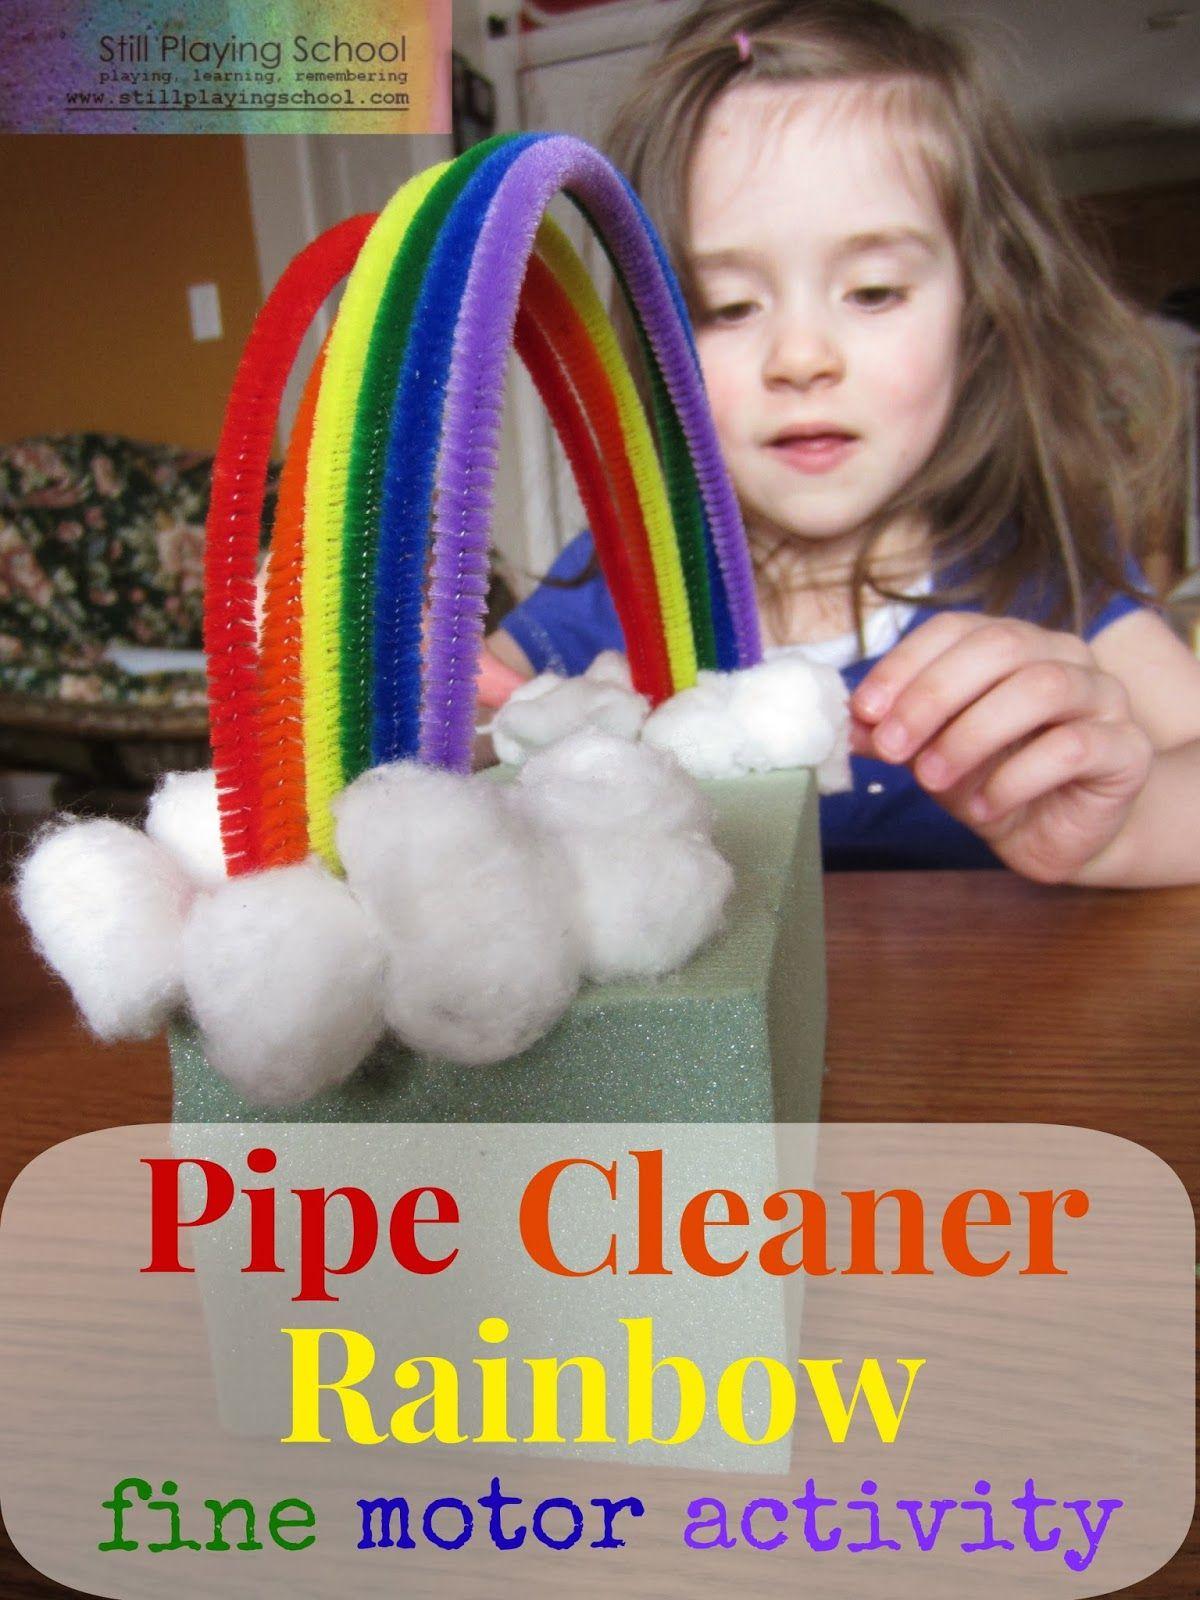 Pipe Cleaner Rainbow